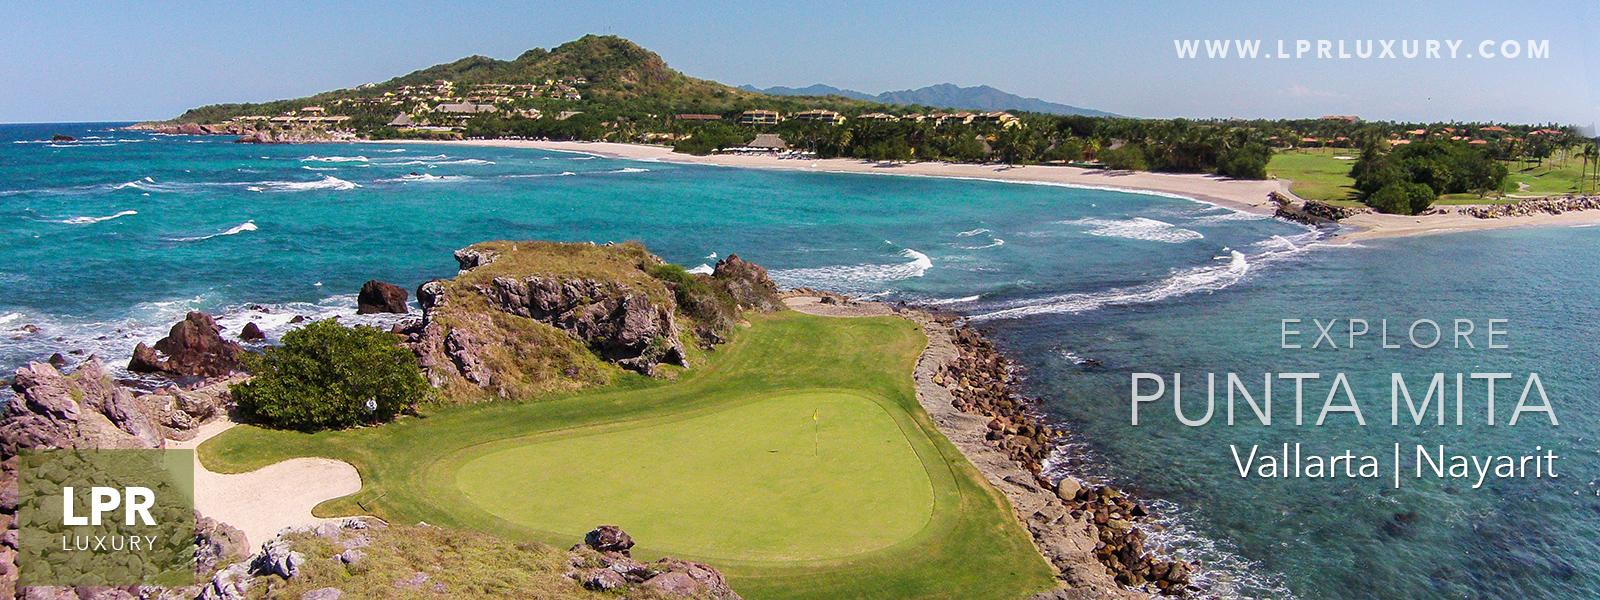 The Ultra Luxury Punta Mita Resort